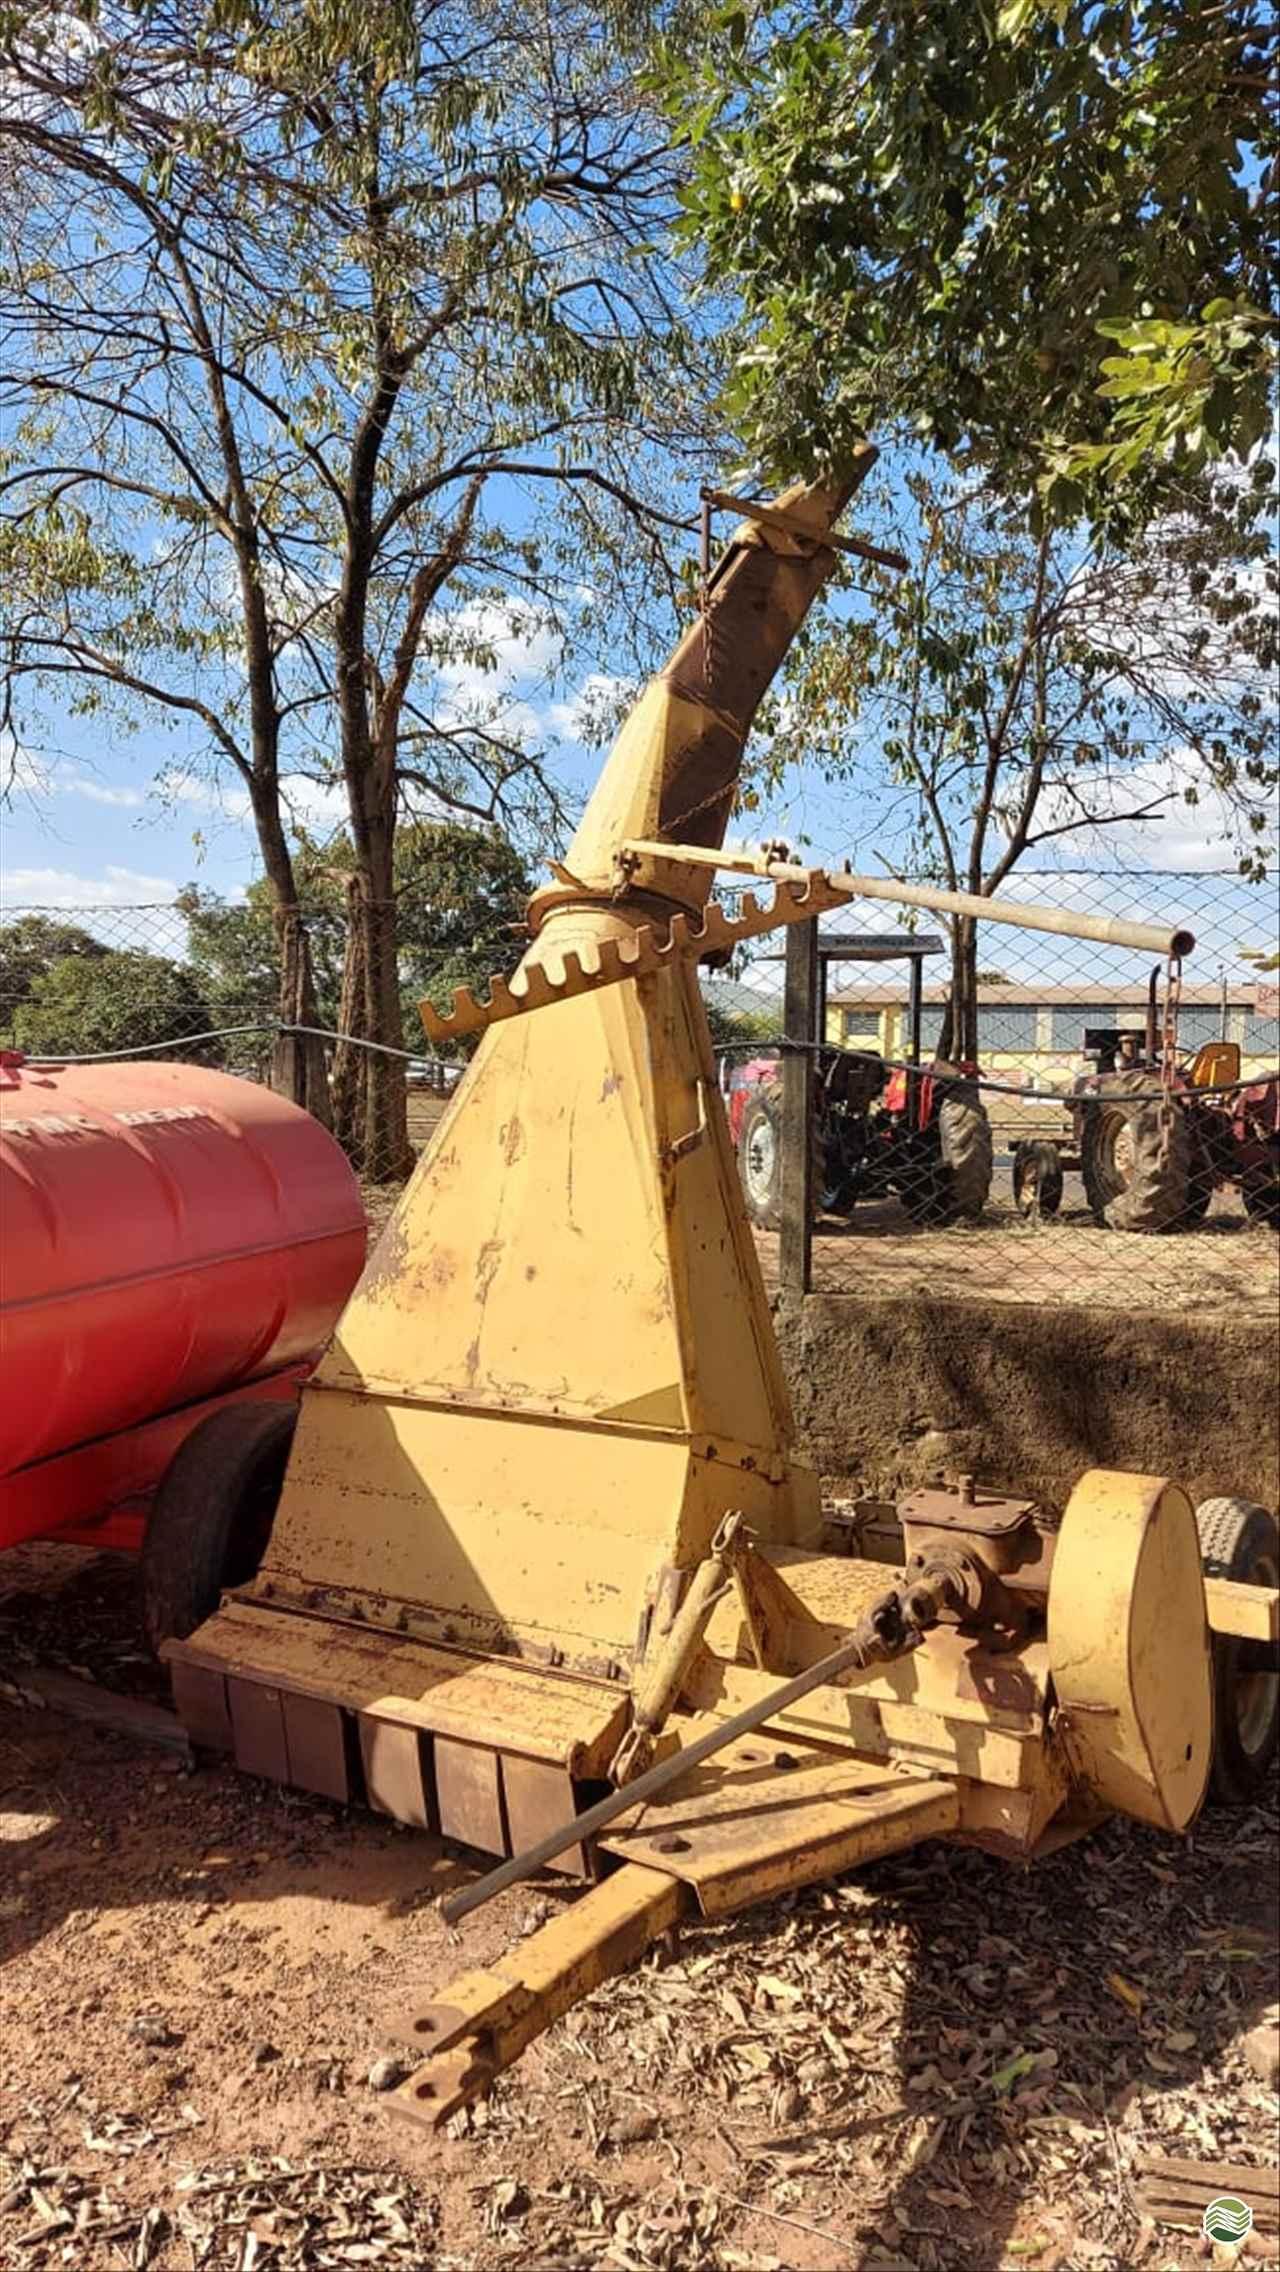 ENSILADEIRA COLHEDORA DE CAPIM  20 Terra Santa Implementos Agrícolas